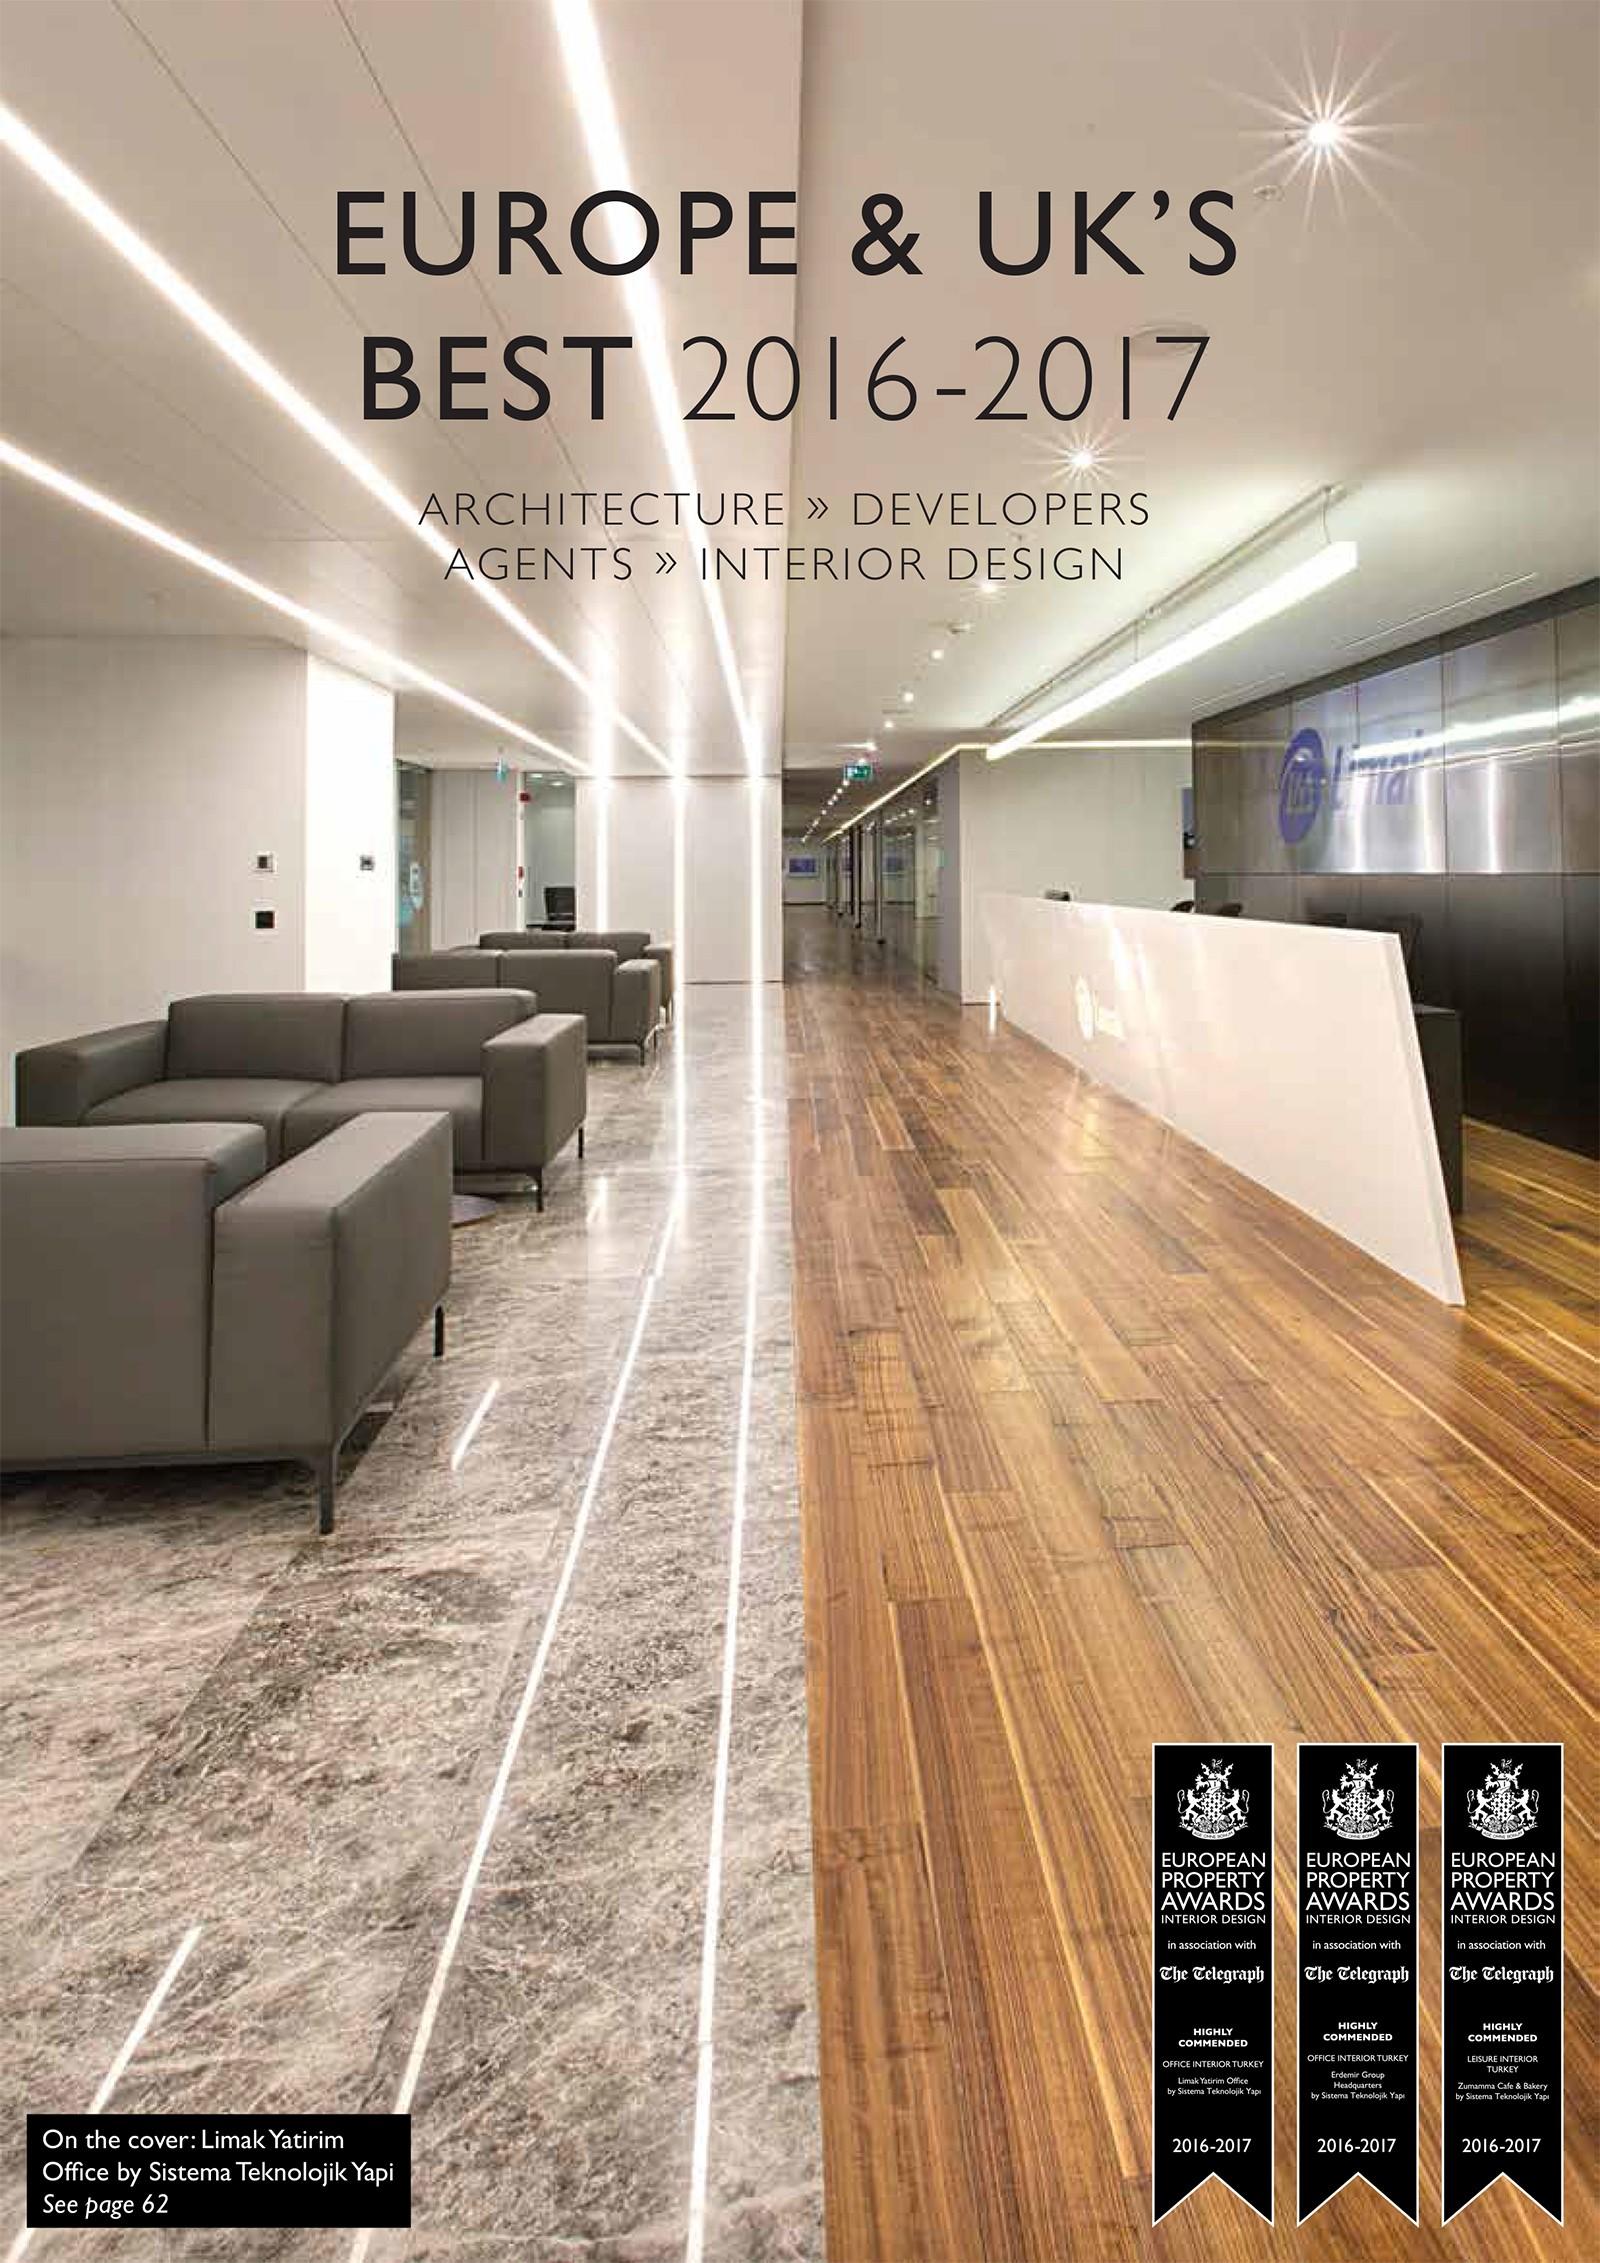 Europe & UK's Best 2016-2017